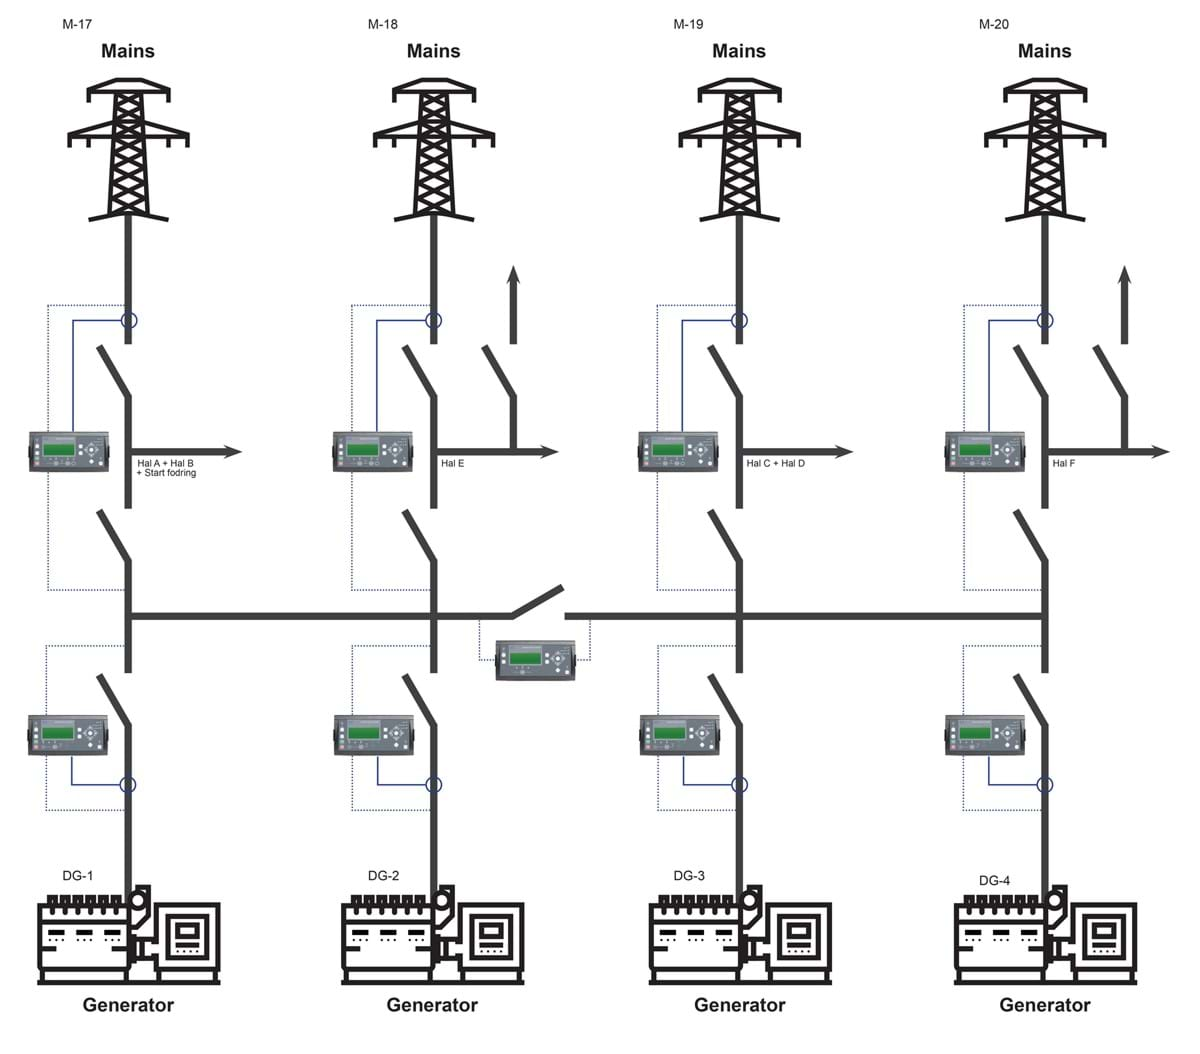 04 Diagrams Bakkafrost Case